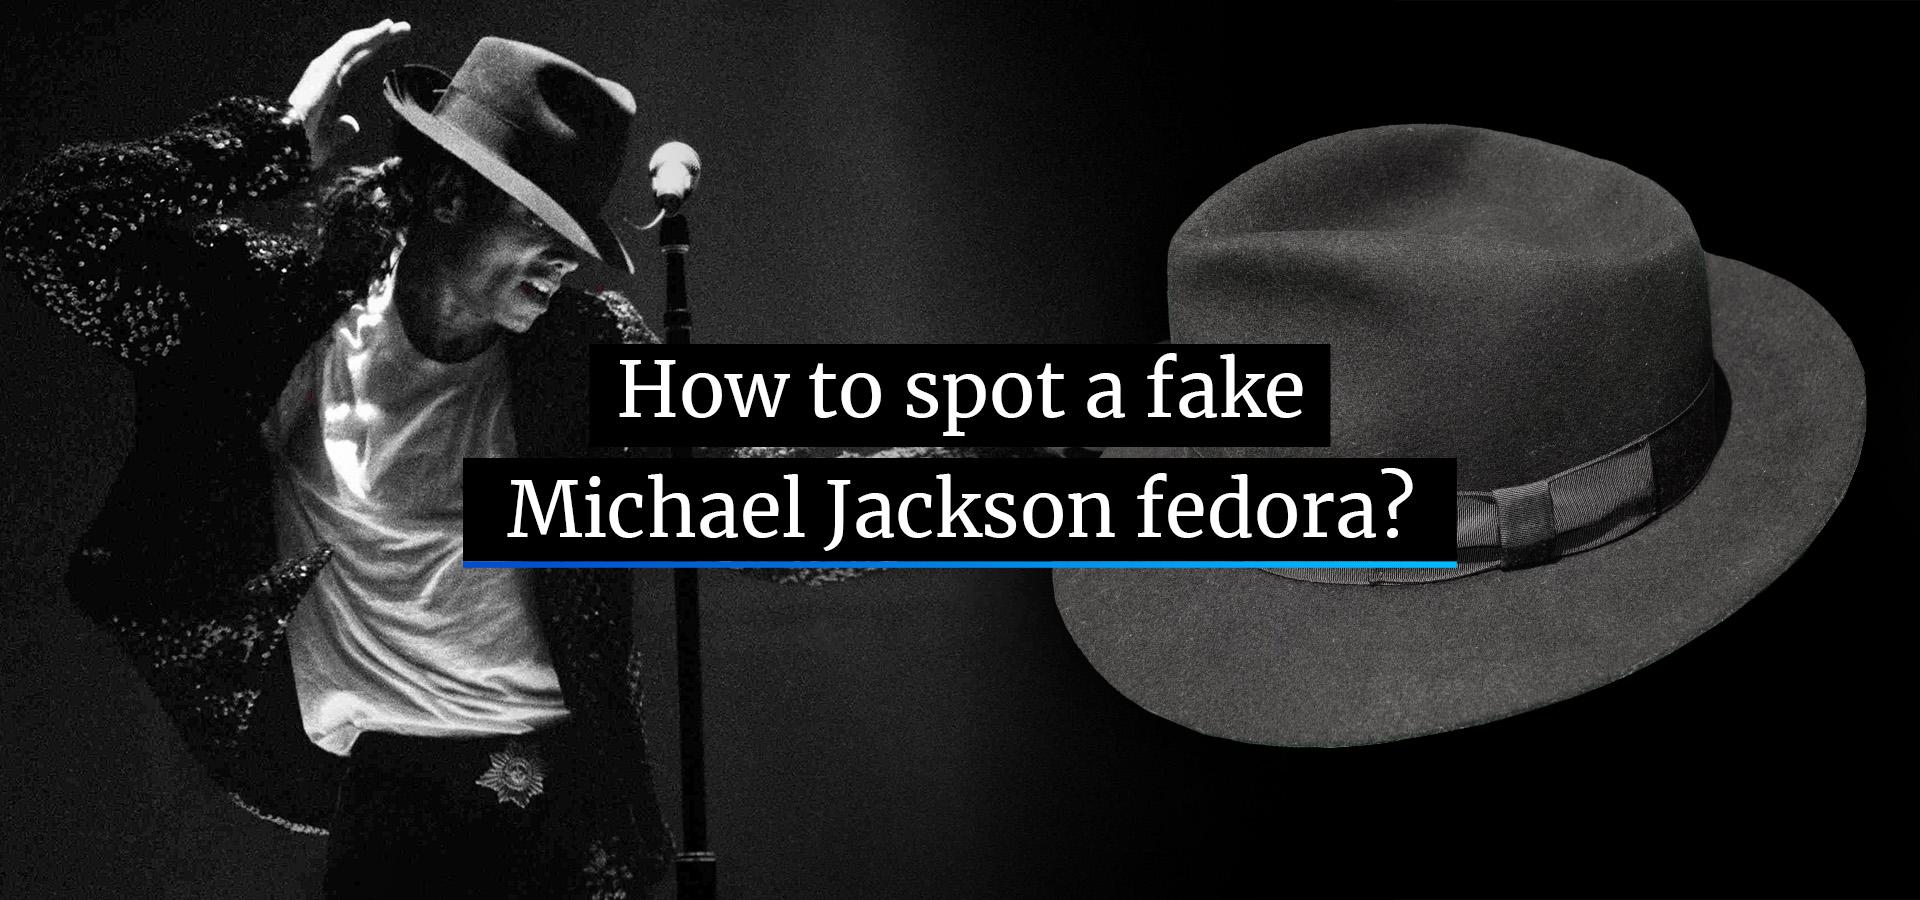 How to spot a fake Michael Jackson fedora?